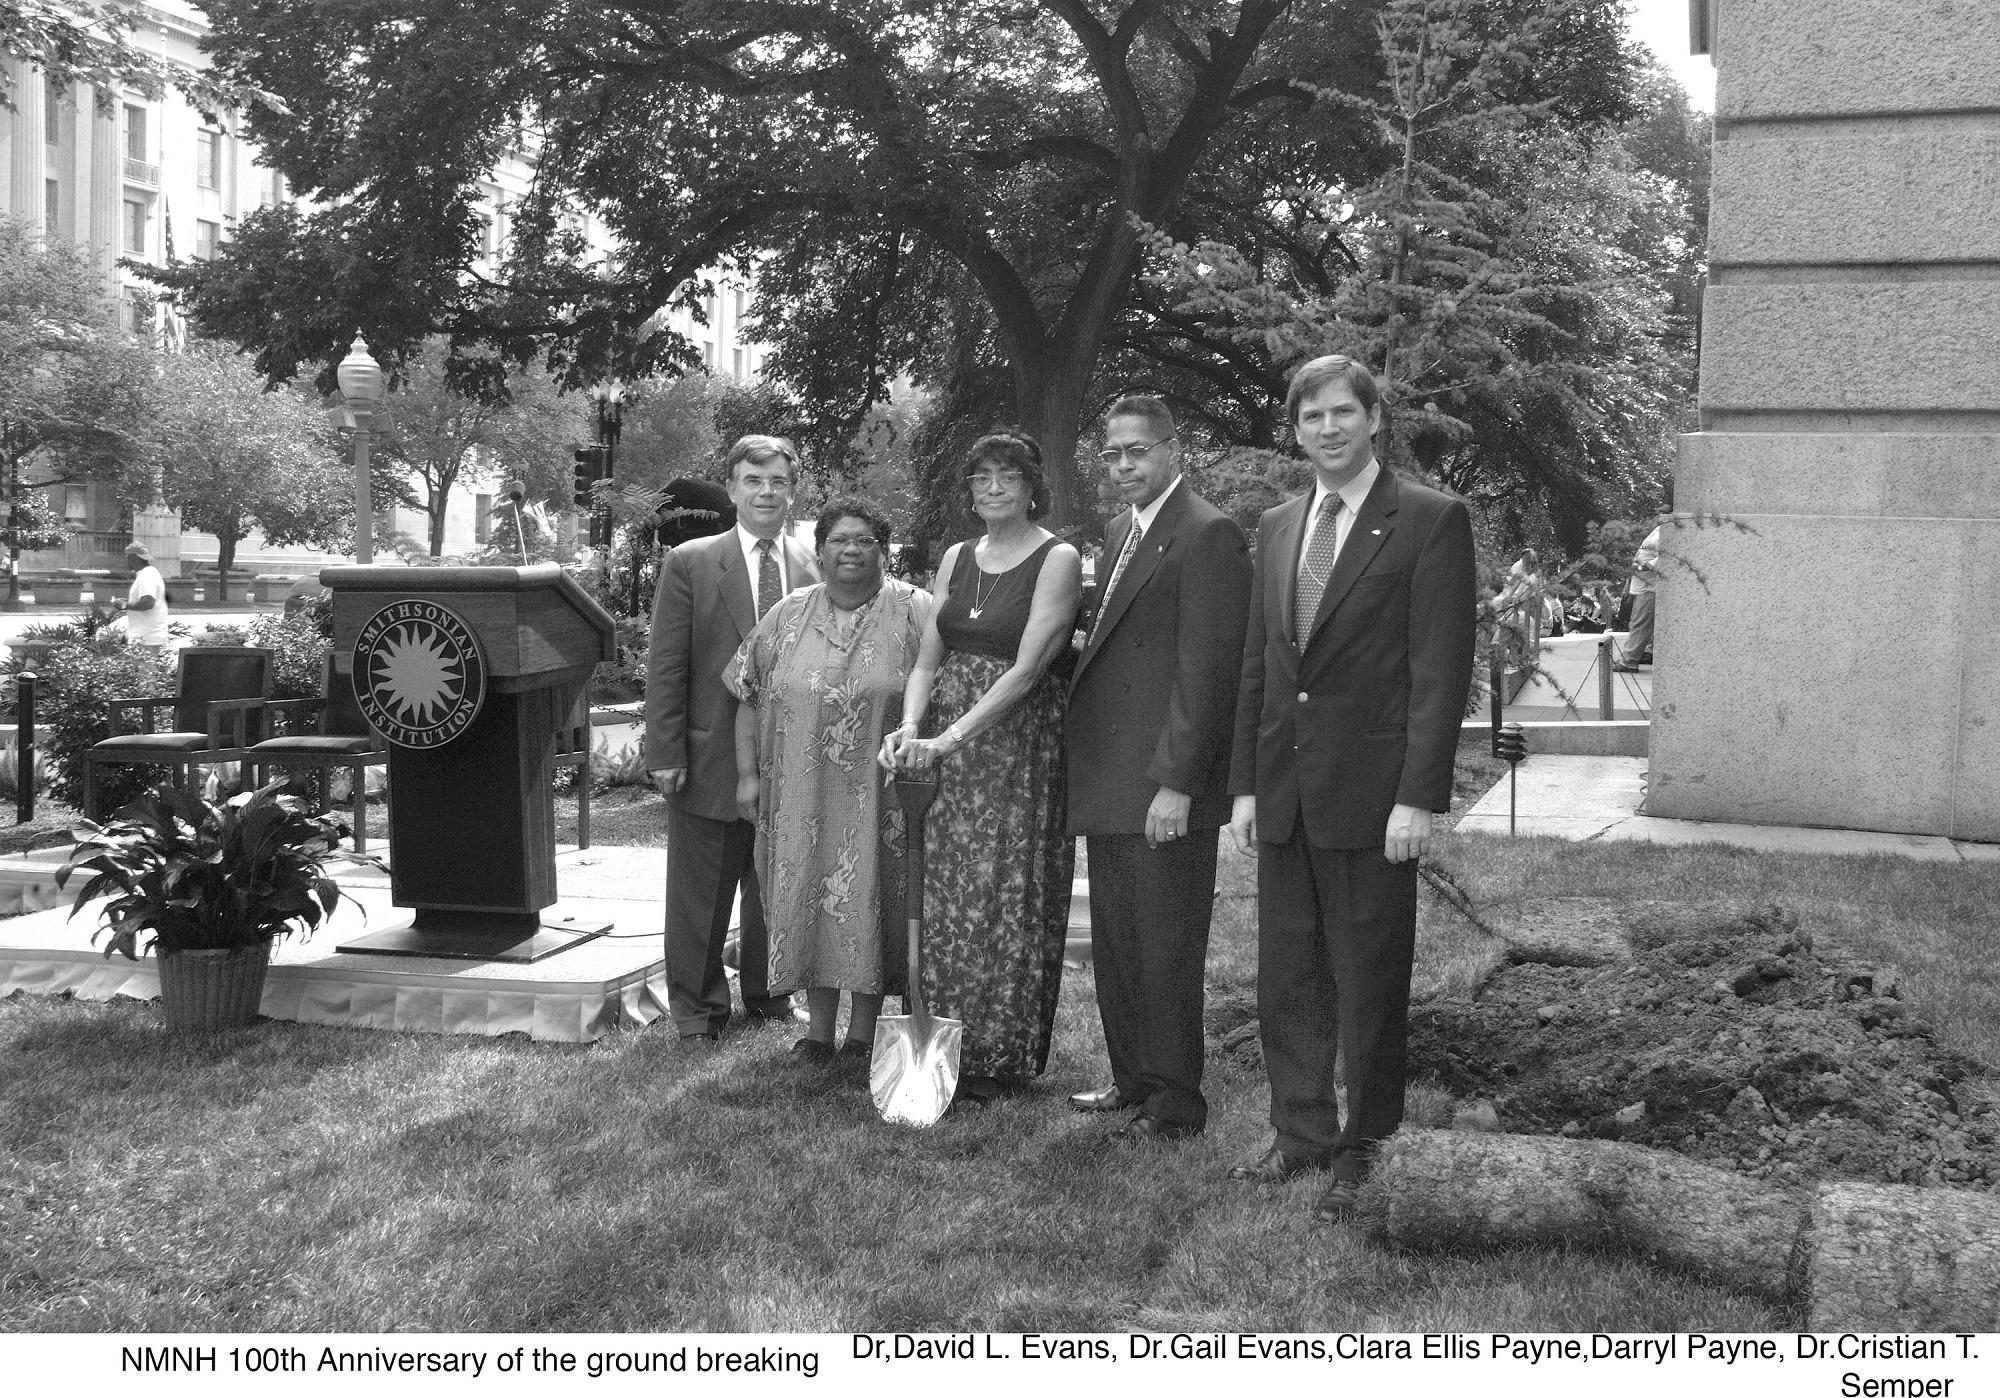 Solomon Brown Tribute with D. Evans, G. Lowe, C.E. Payne, D.B. Payne & C. Samper